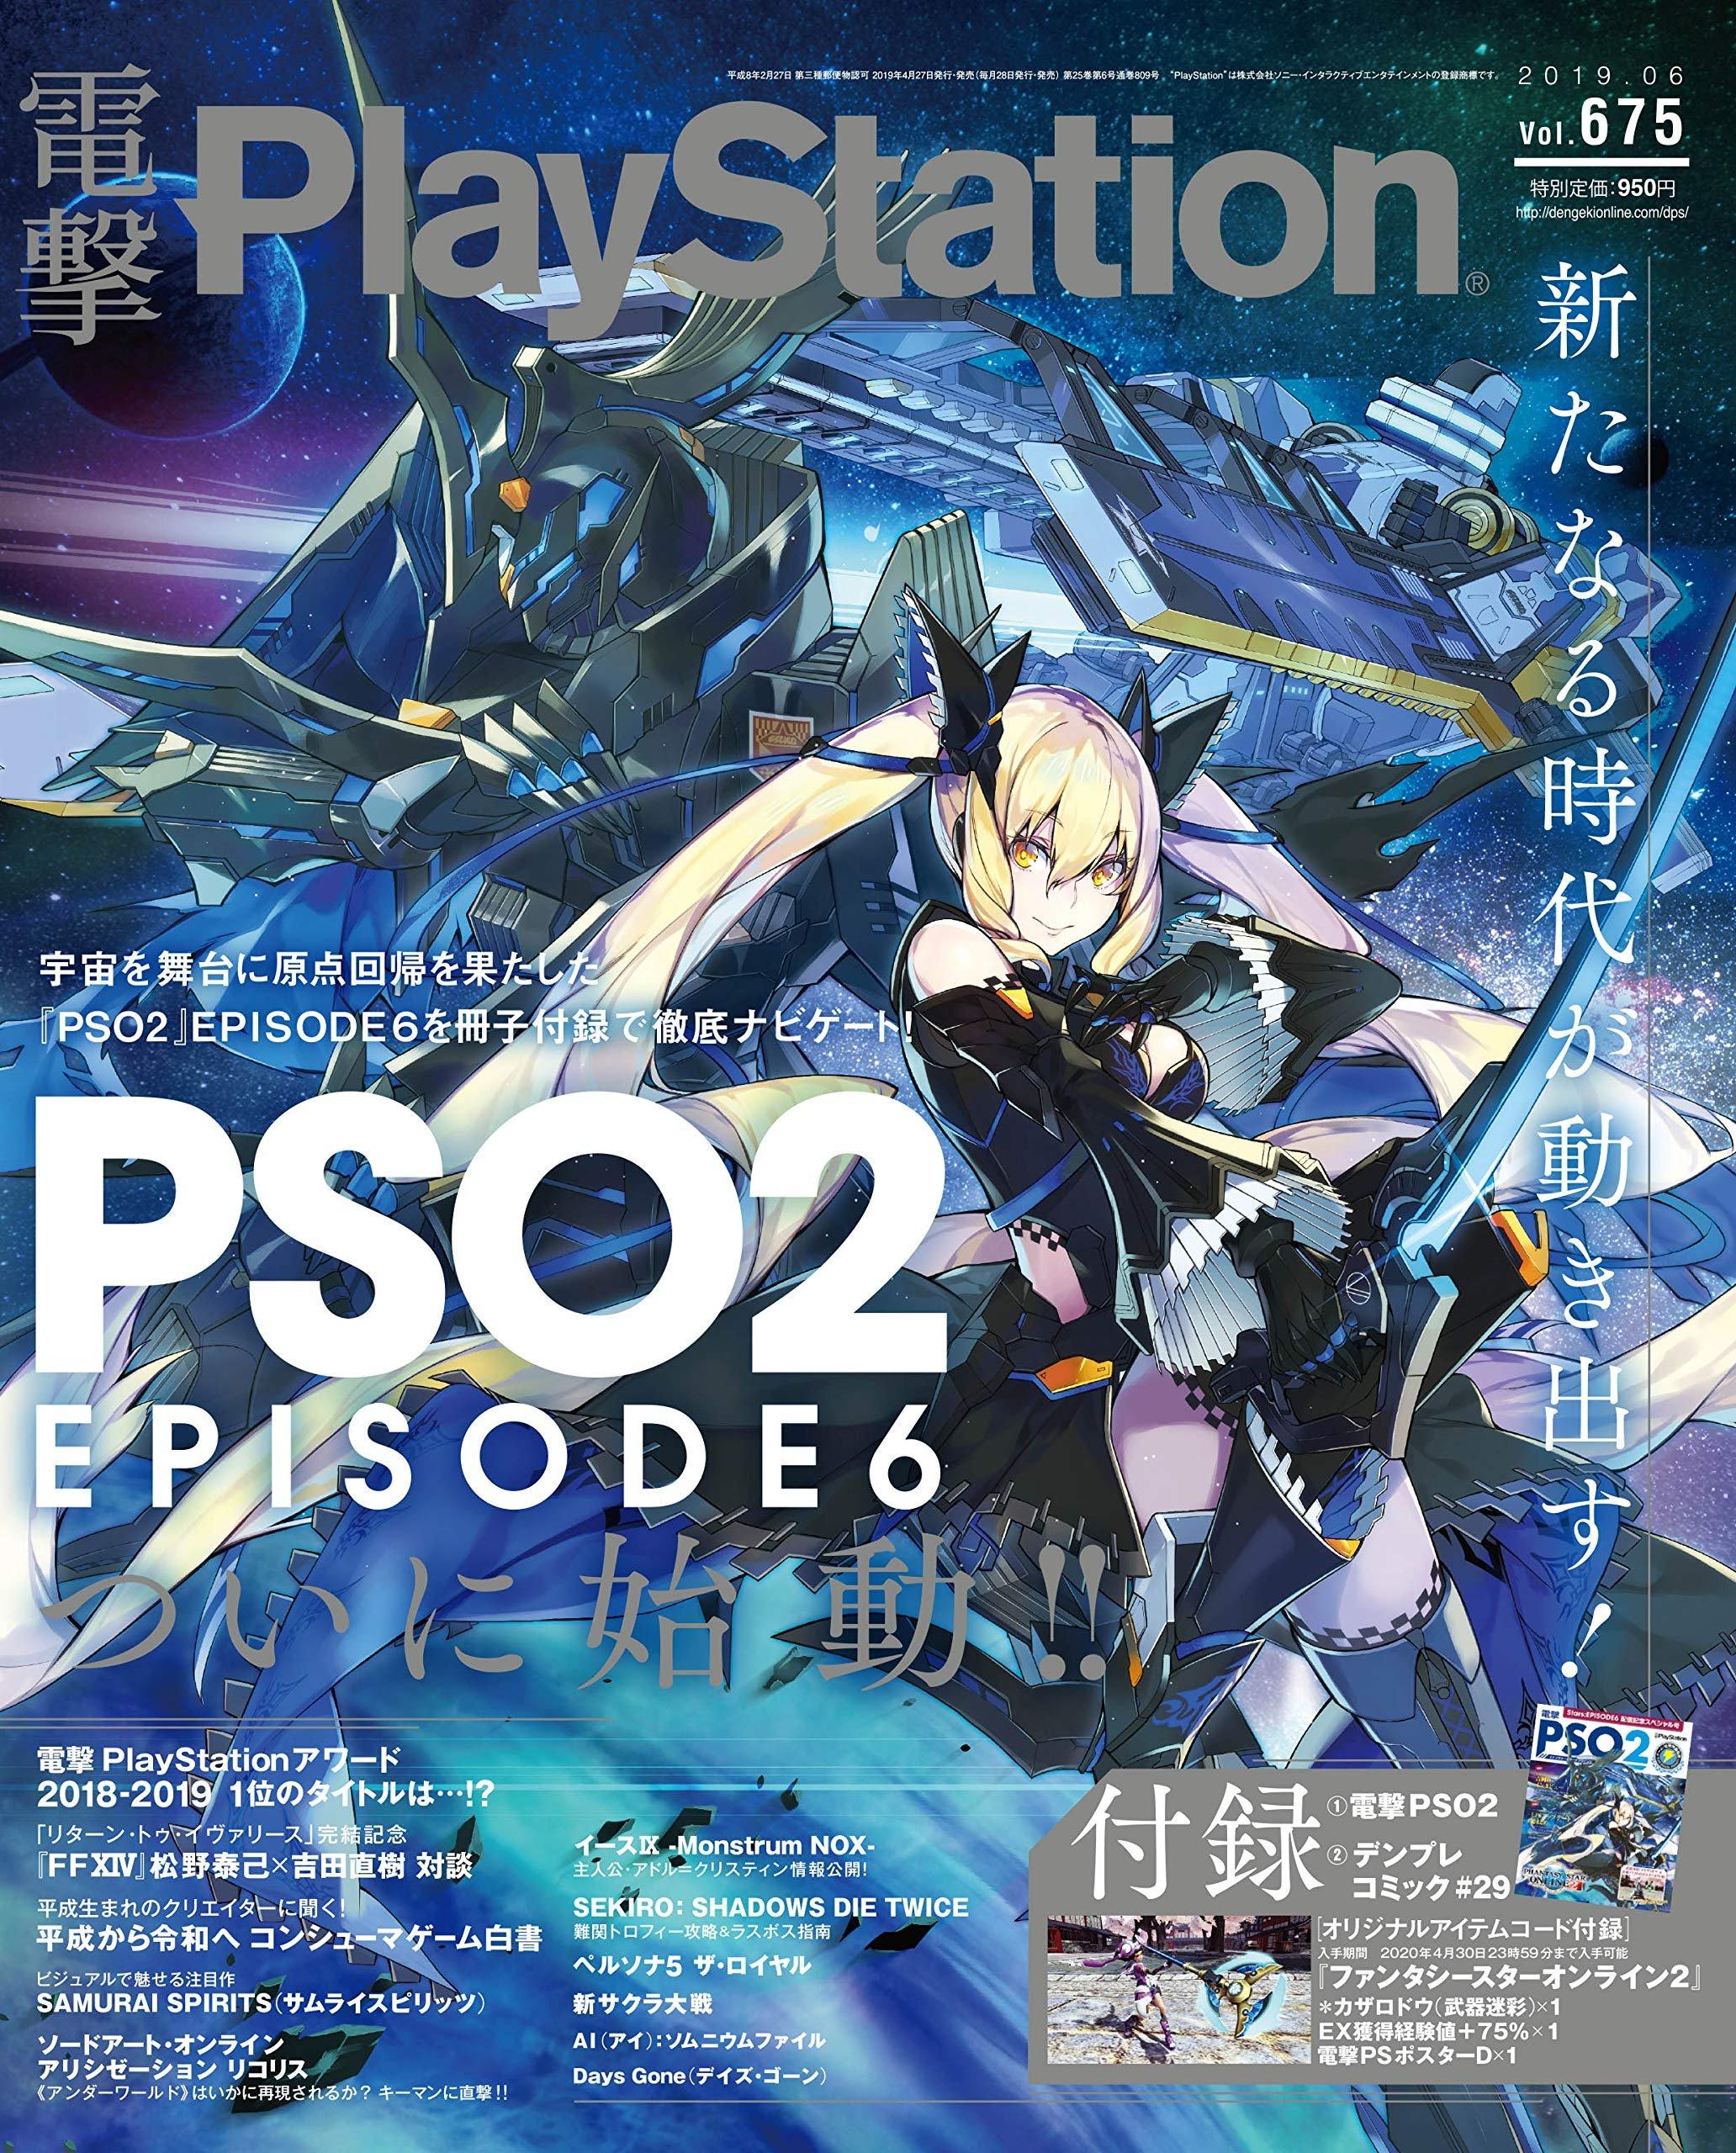 Dengeki PlayStation 675 (June 2019)